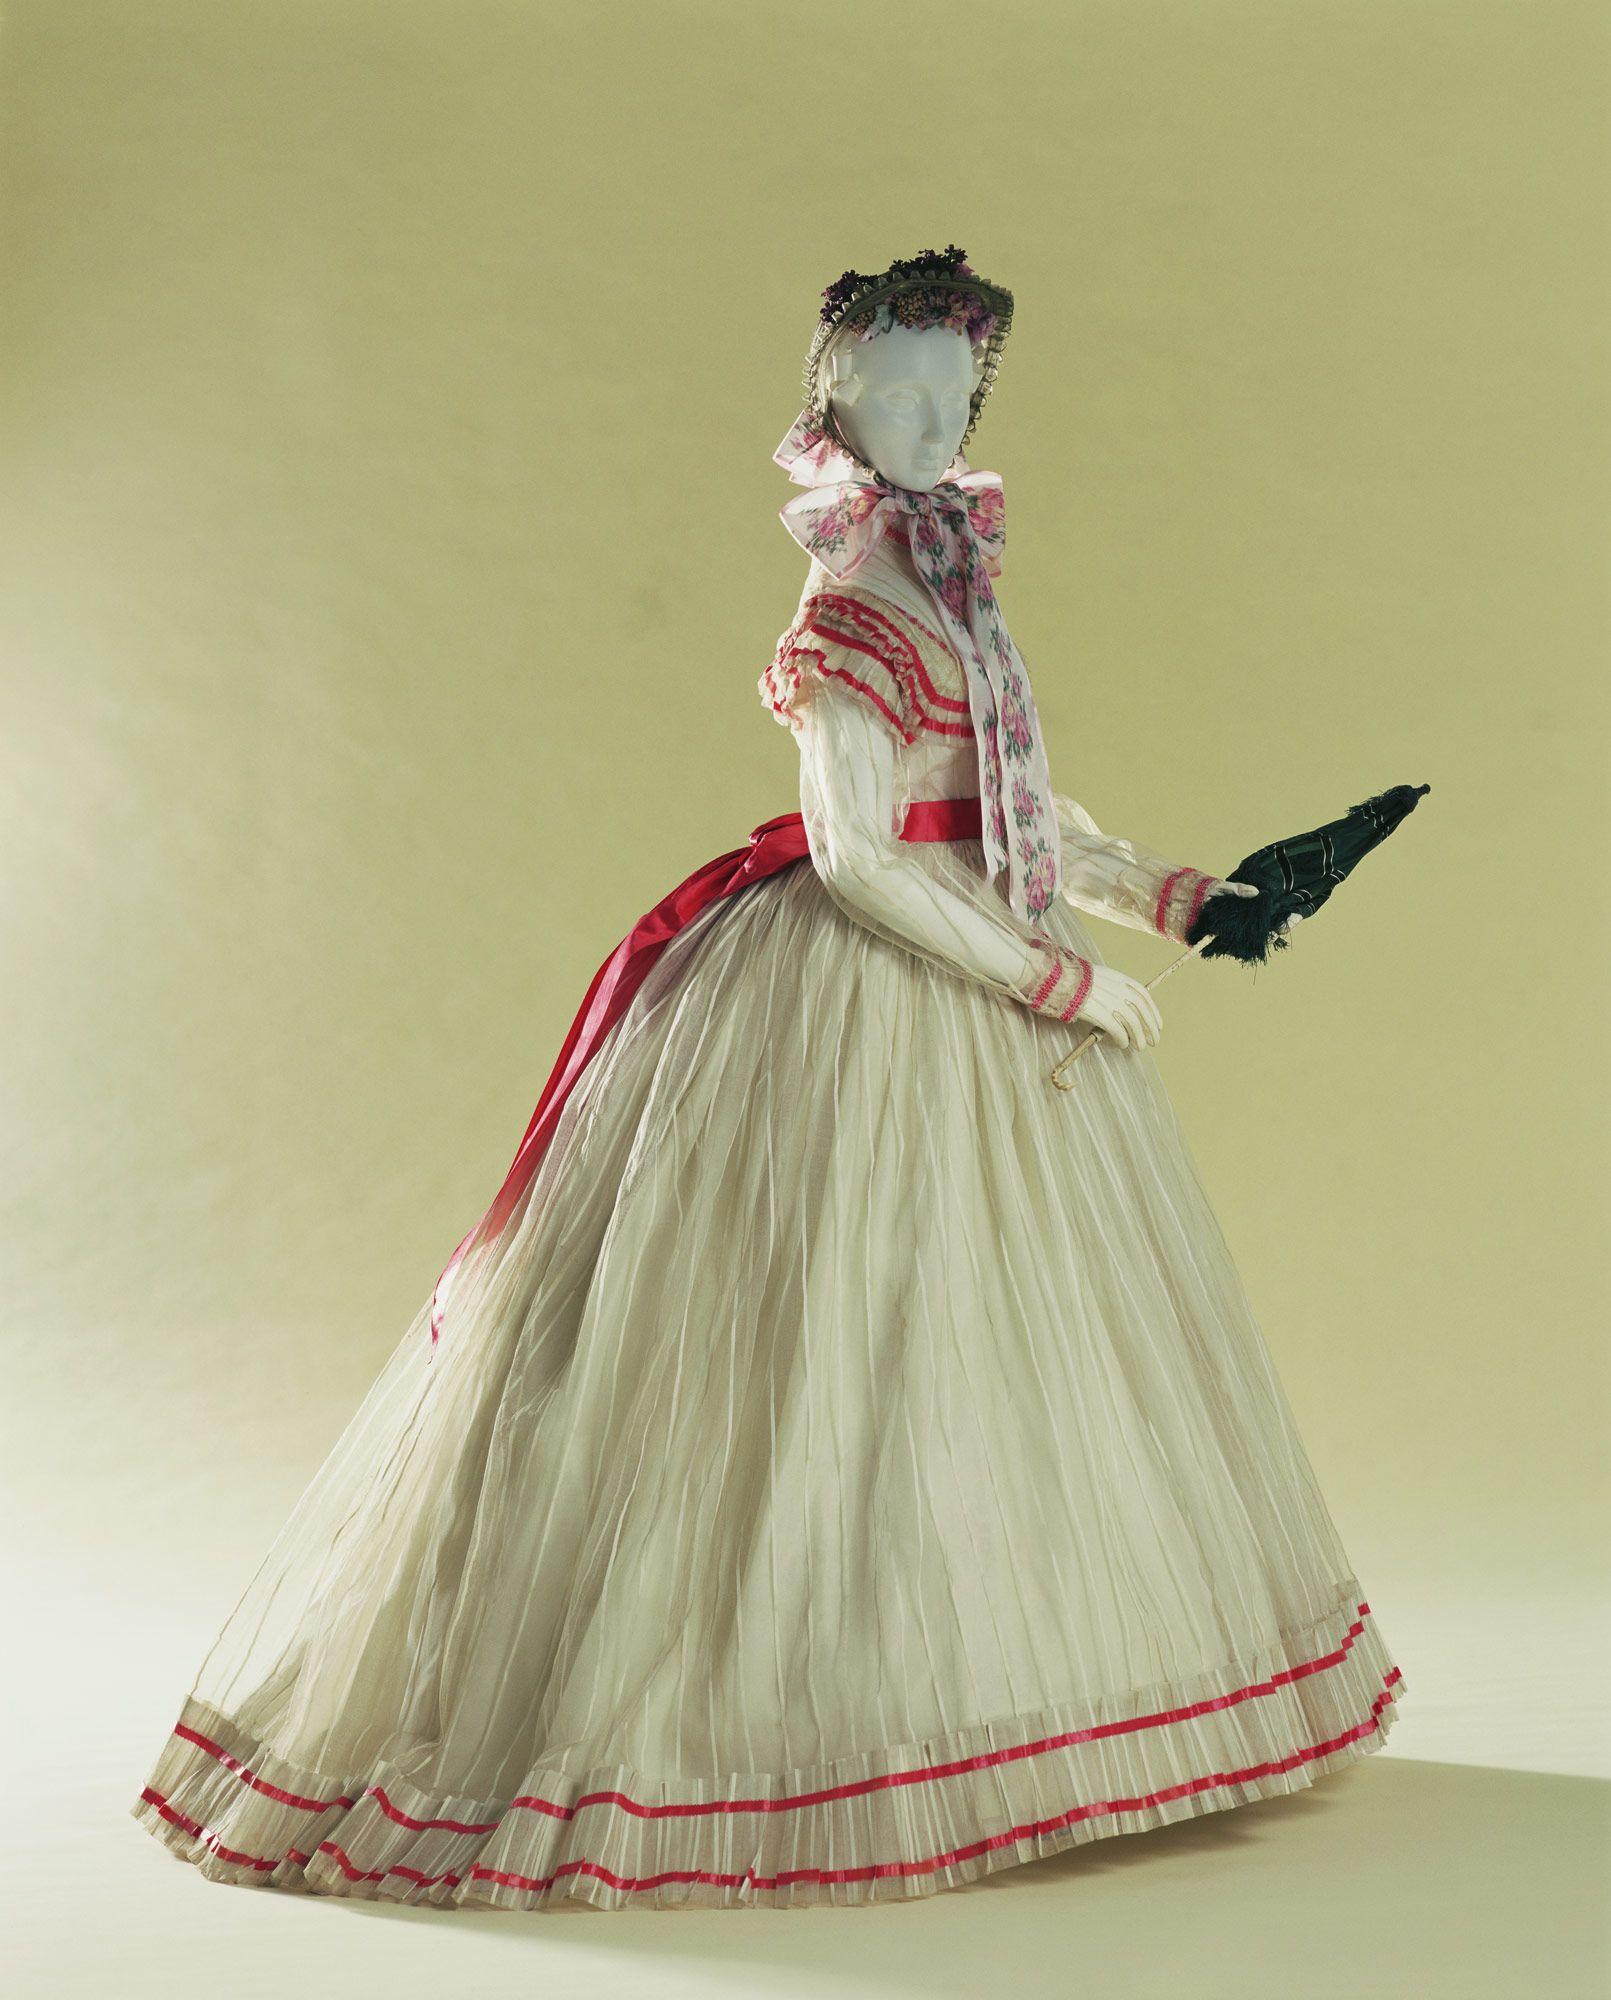 Day Dress I Love The Bonnet Fashion Day Dresses Historical Dresses [ 2000 x 1611 Pixel ]